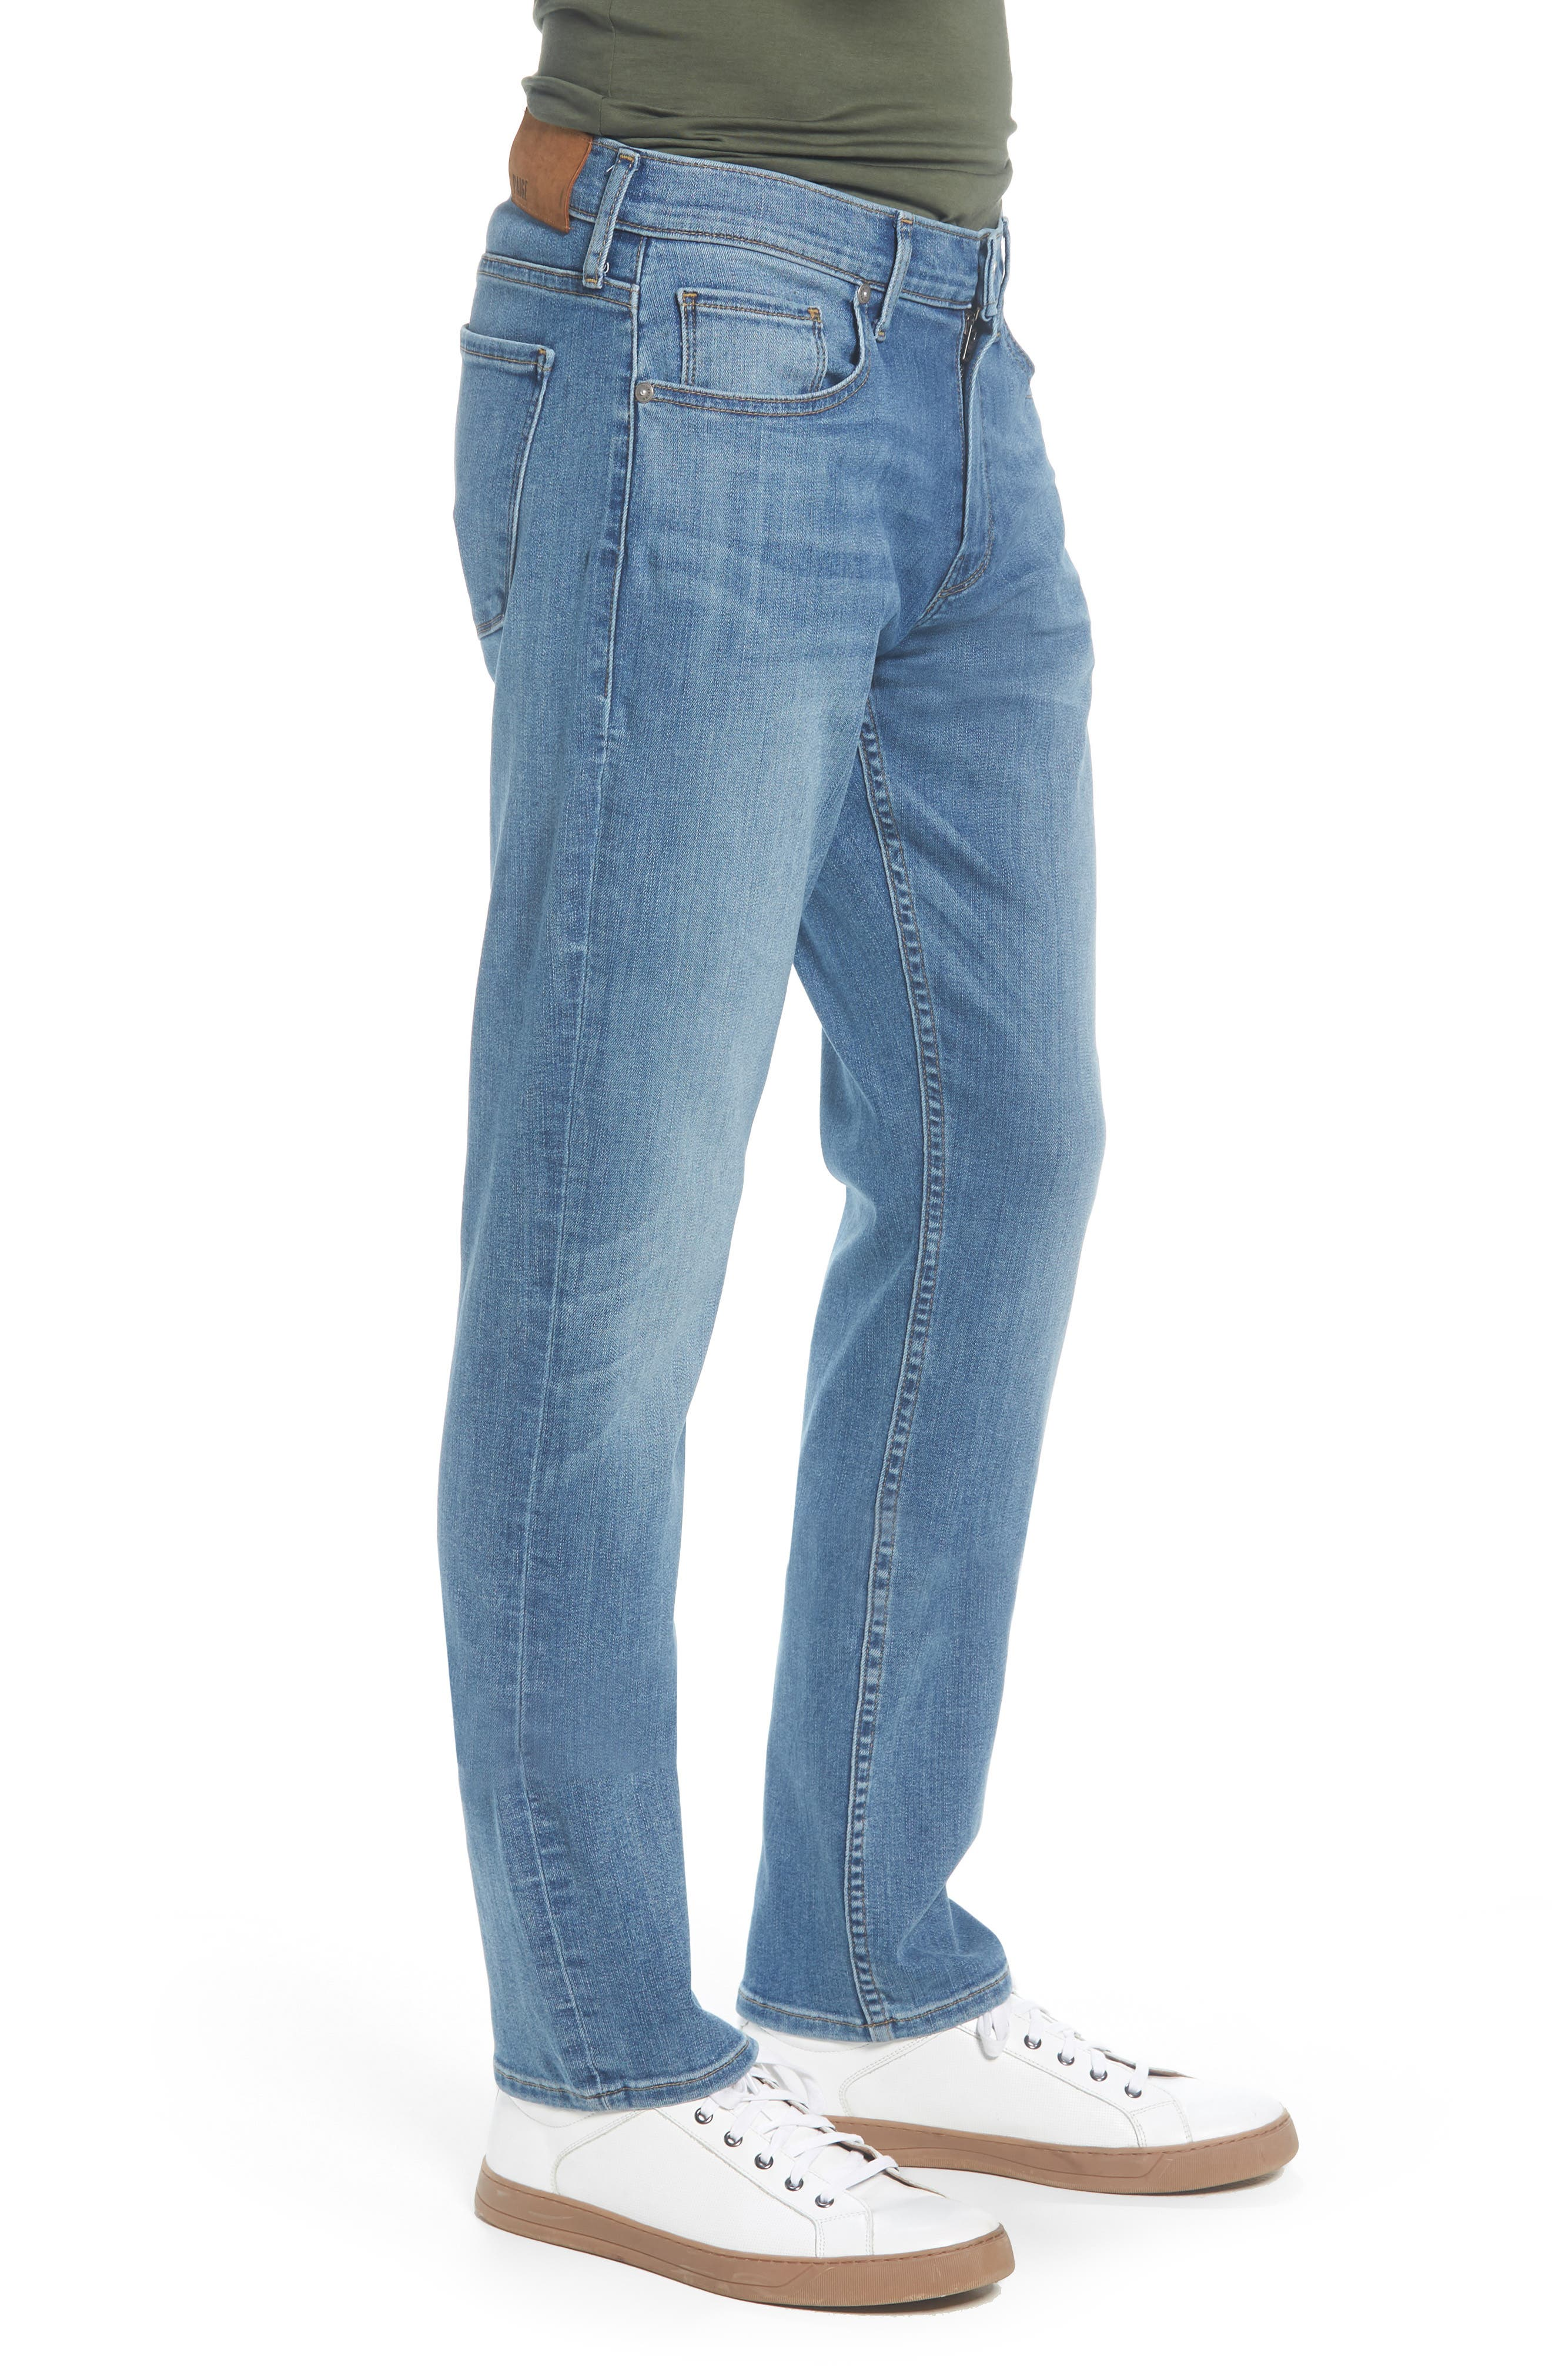 PAIGE,                             Federal Slim Straight Leg Jeans,                             Alternate thumbnail 3, color,                             400